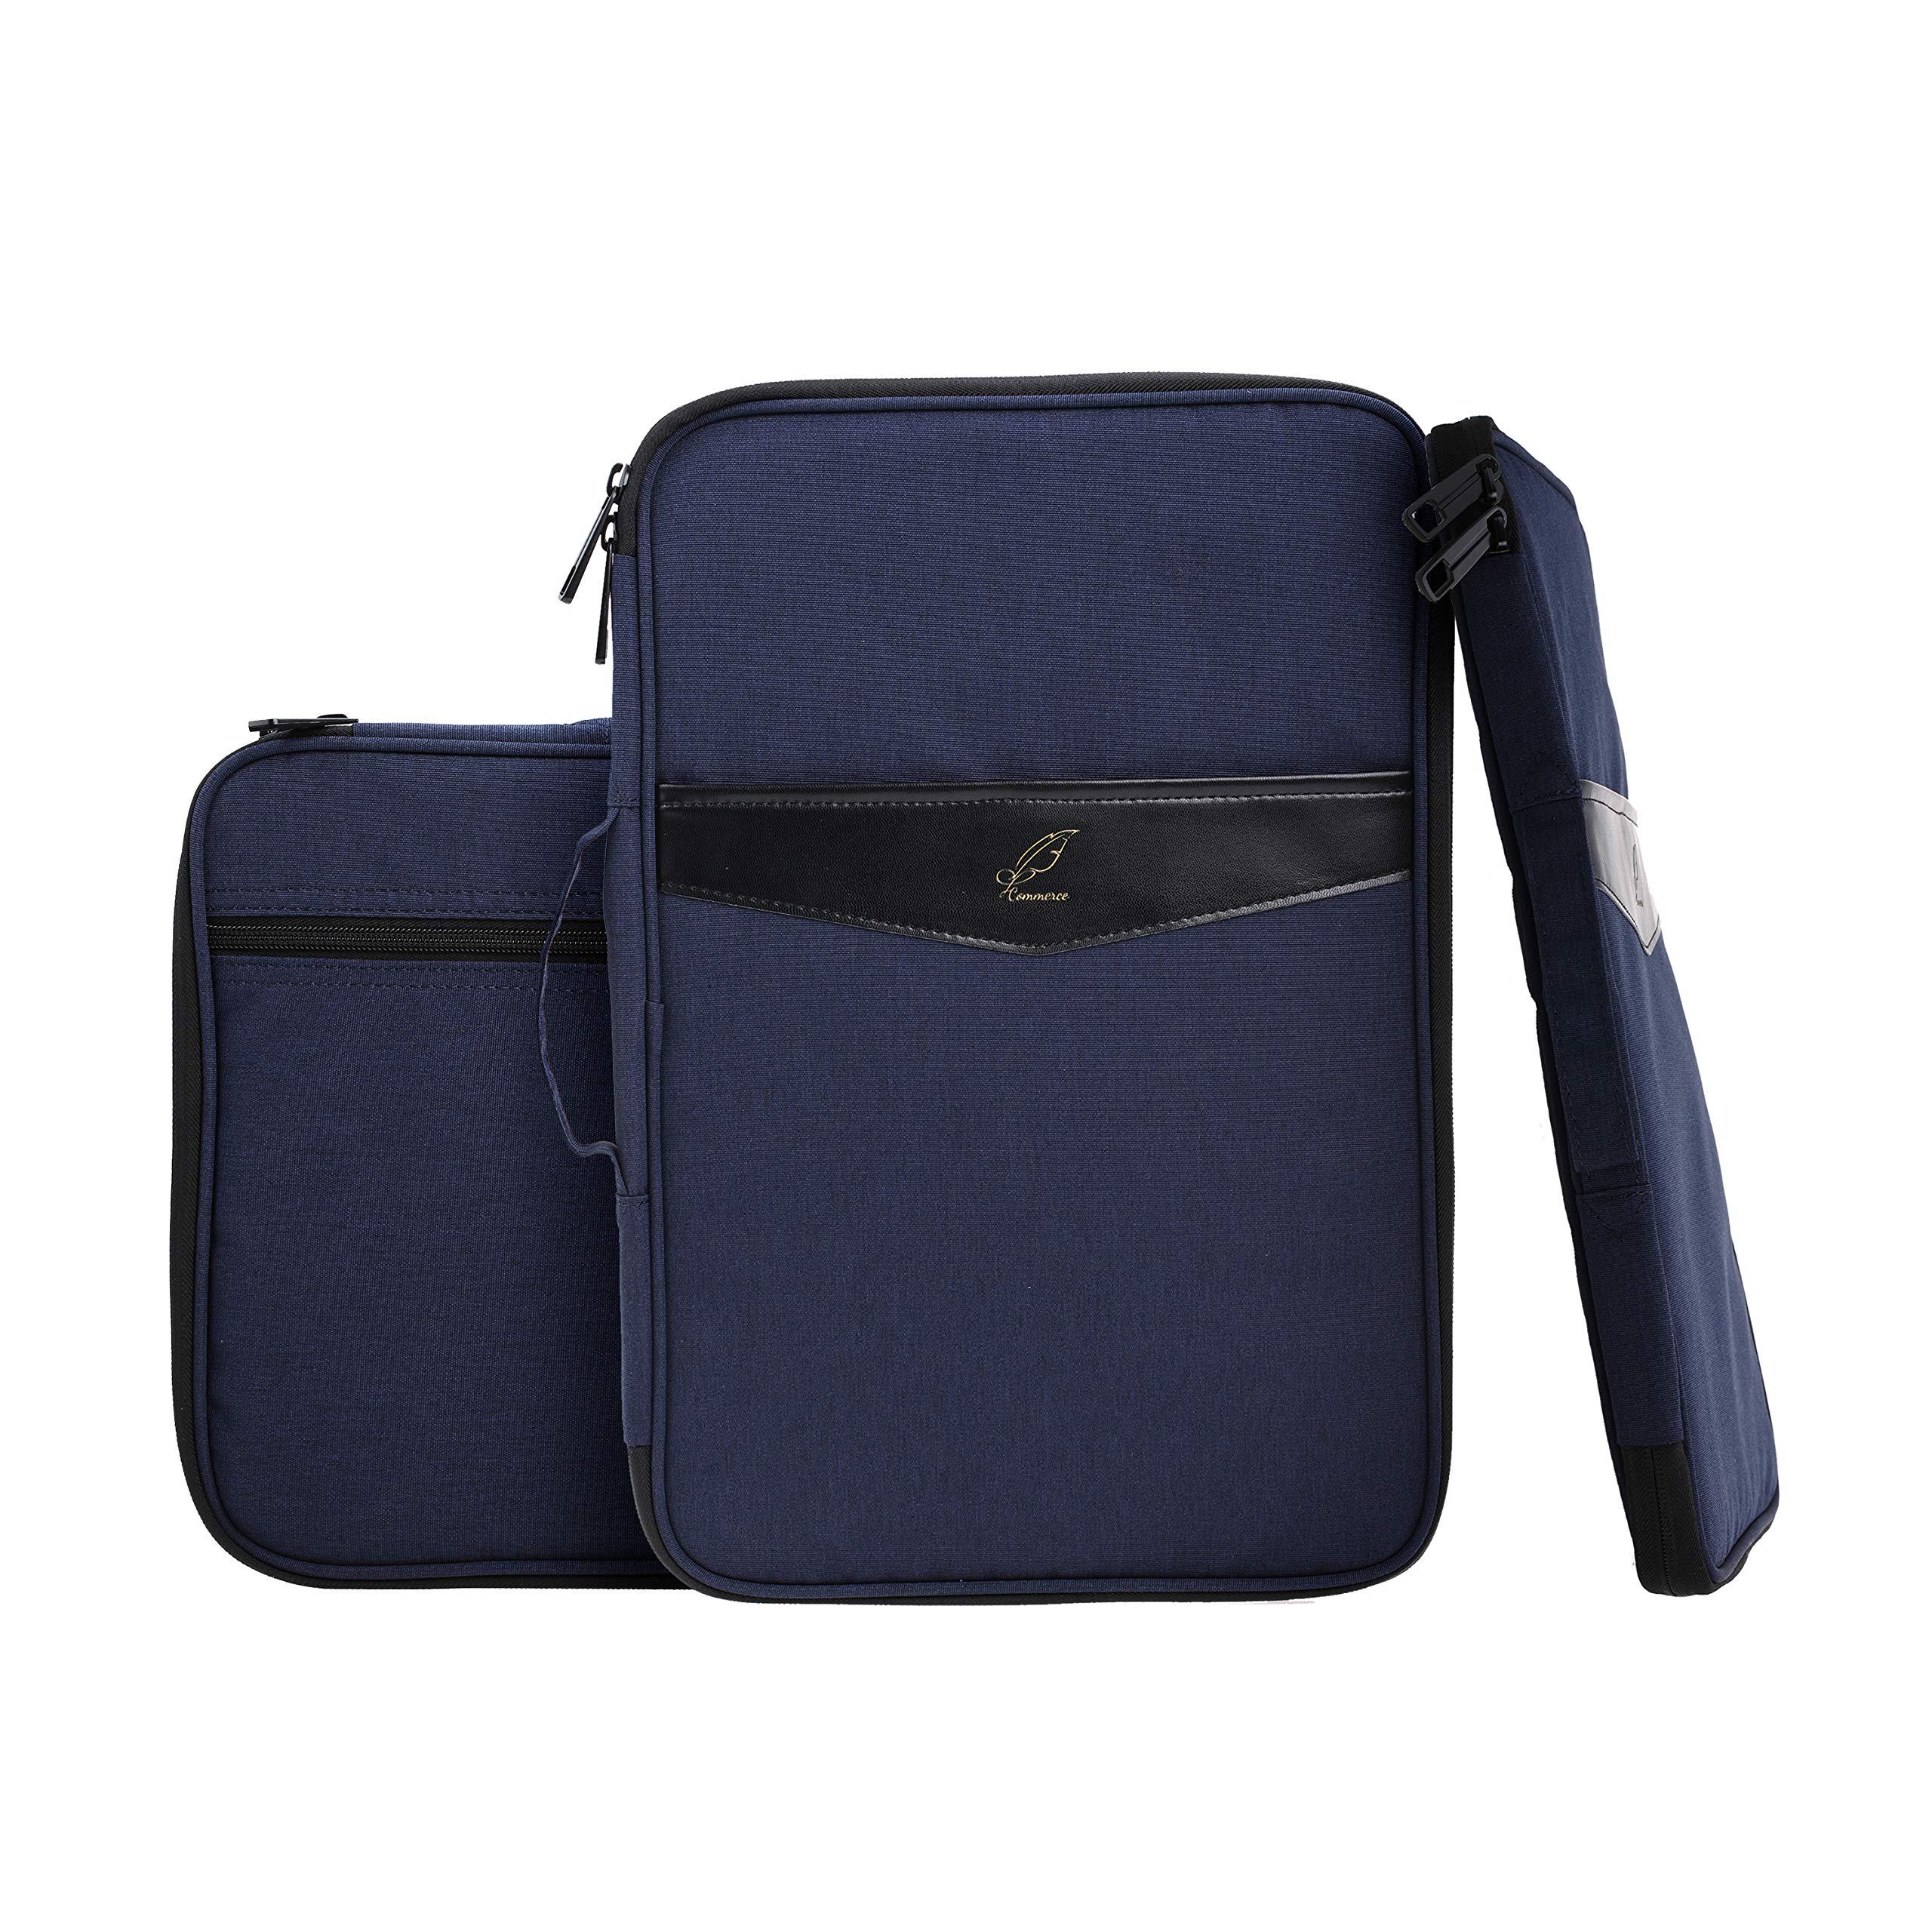 "Lazyaunti Zipper Portfolio Organizer A4 Note Pouch-Waterproof Document Bags/Zipper Binder/Paper Case for 14.5"" Mac,Tablet,Pens,washi Tape,Journals,Sketch Books (Dark Navy Blue)"